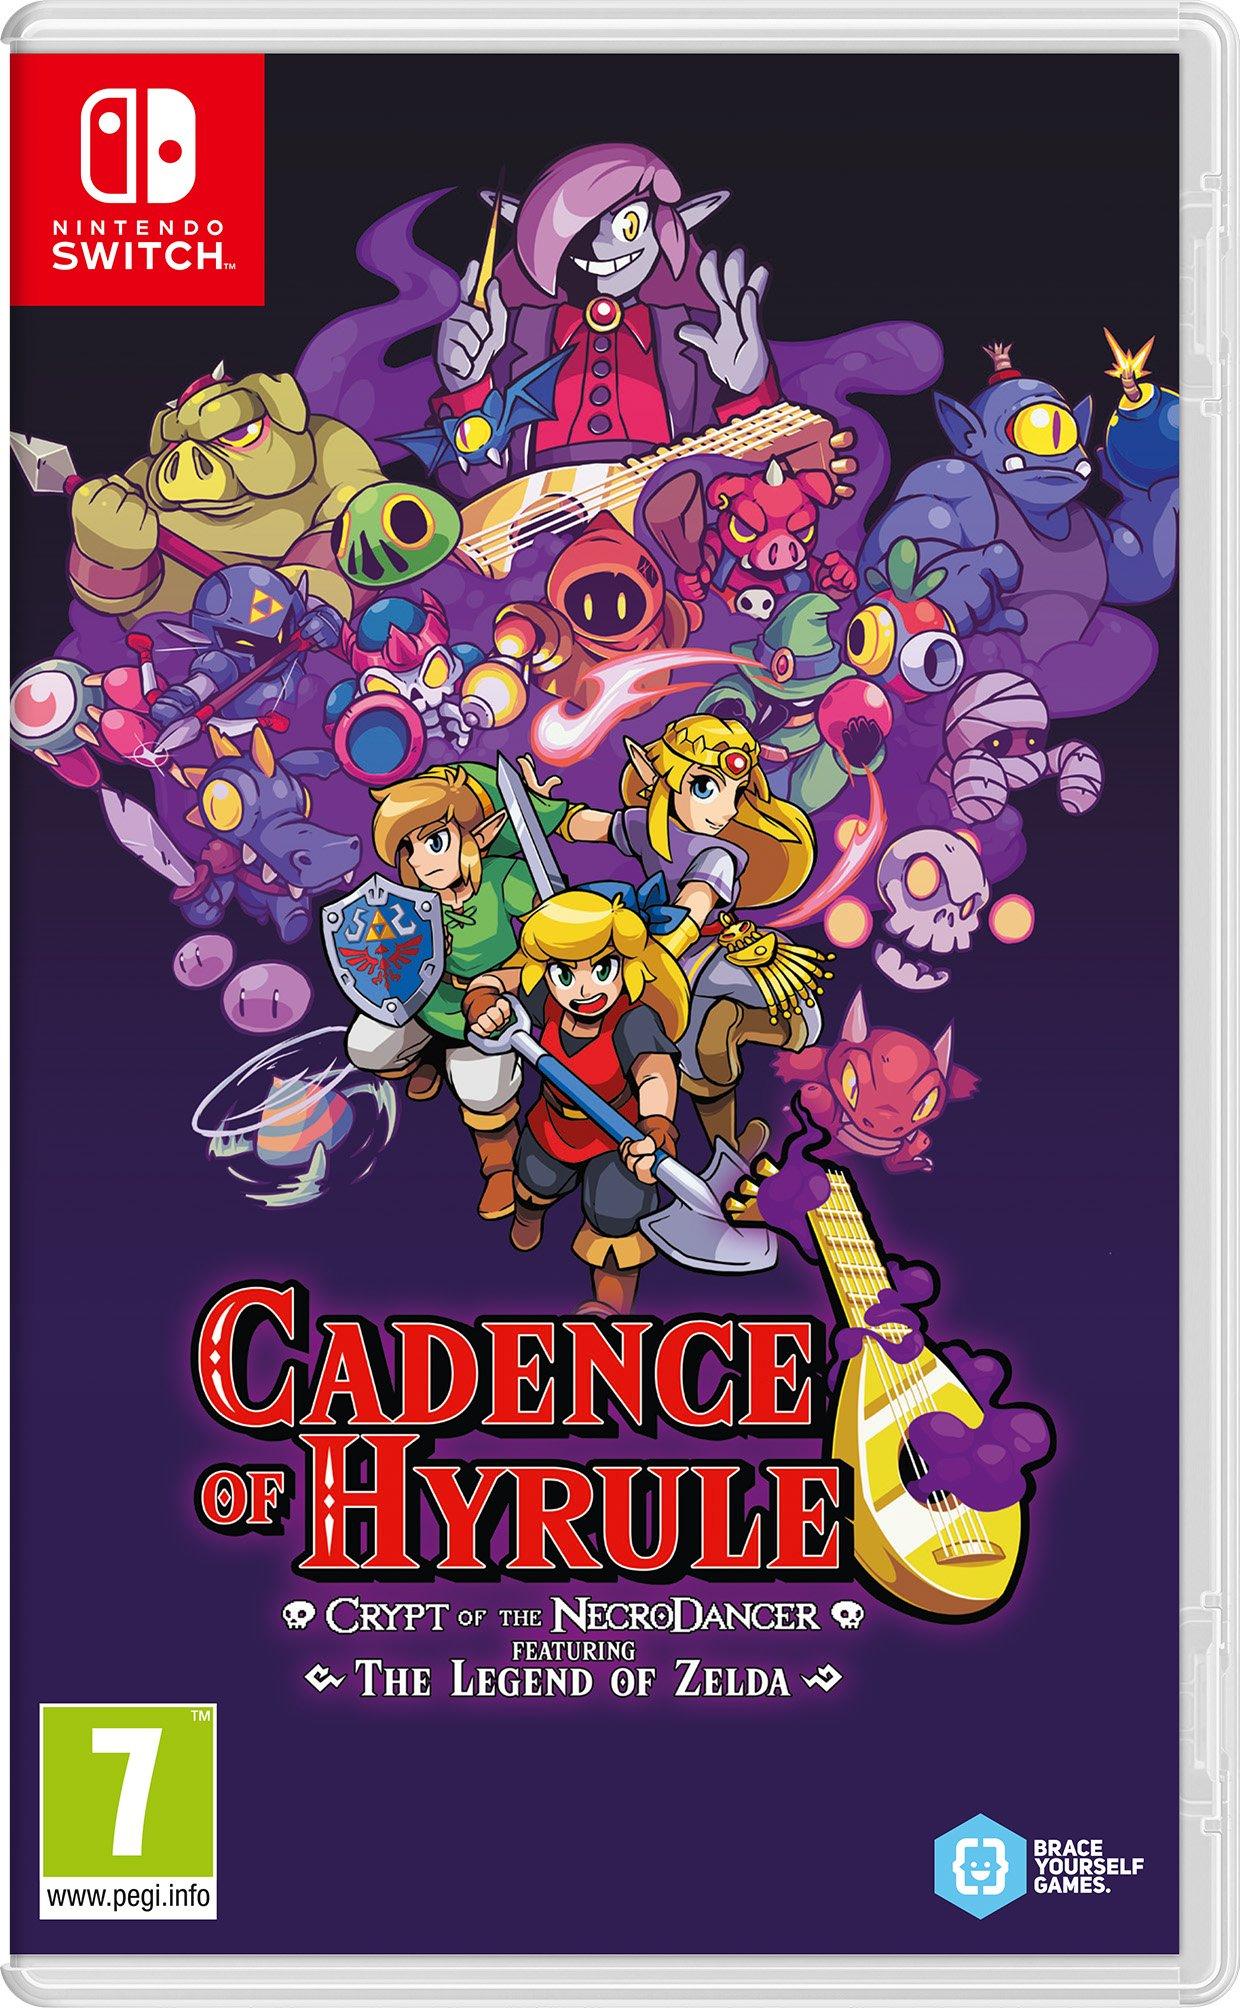 Cadence of Hyrule: Crypt of the NecroDancer